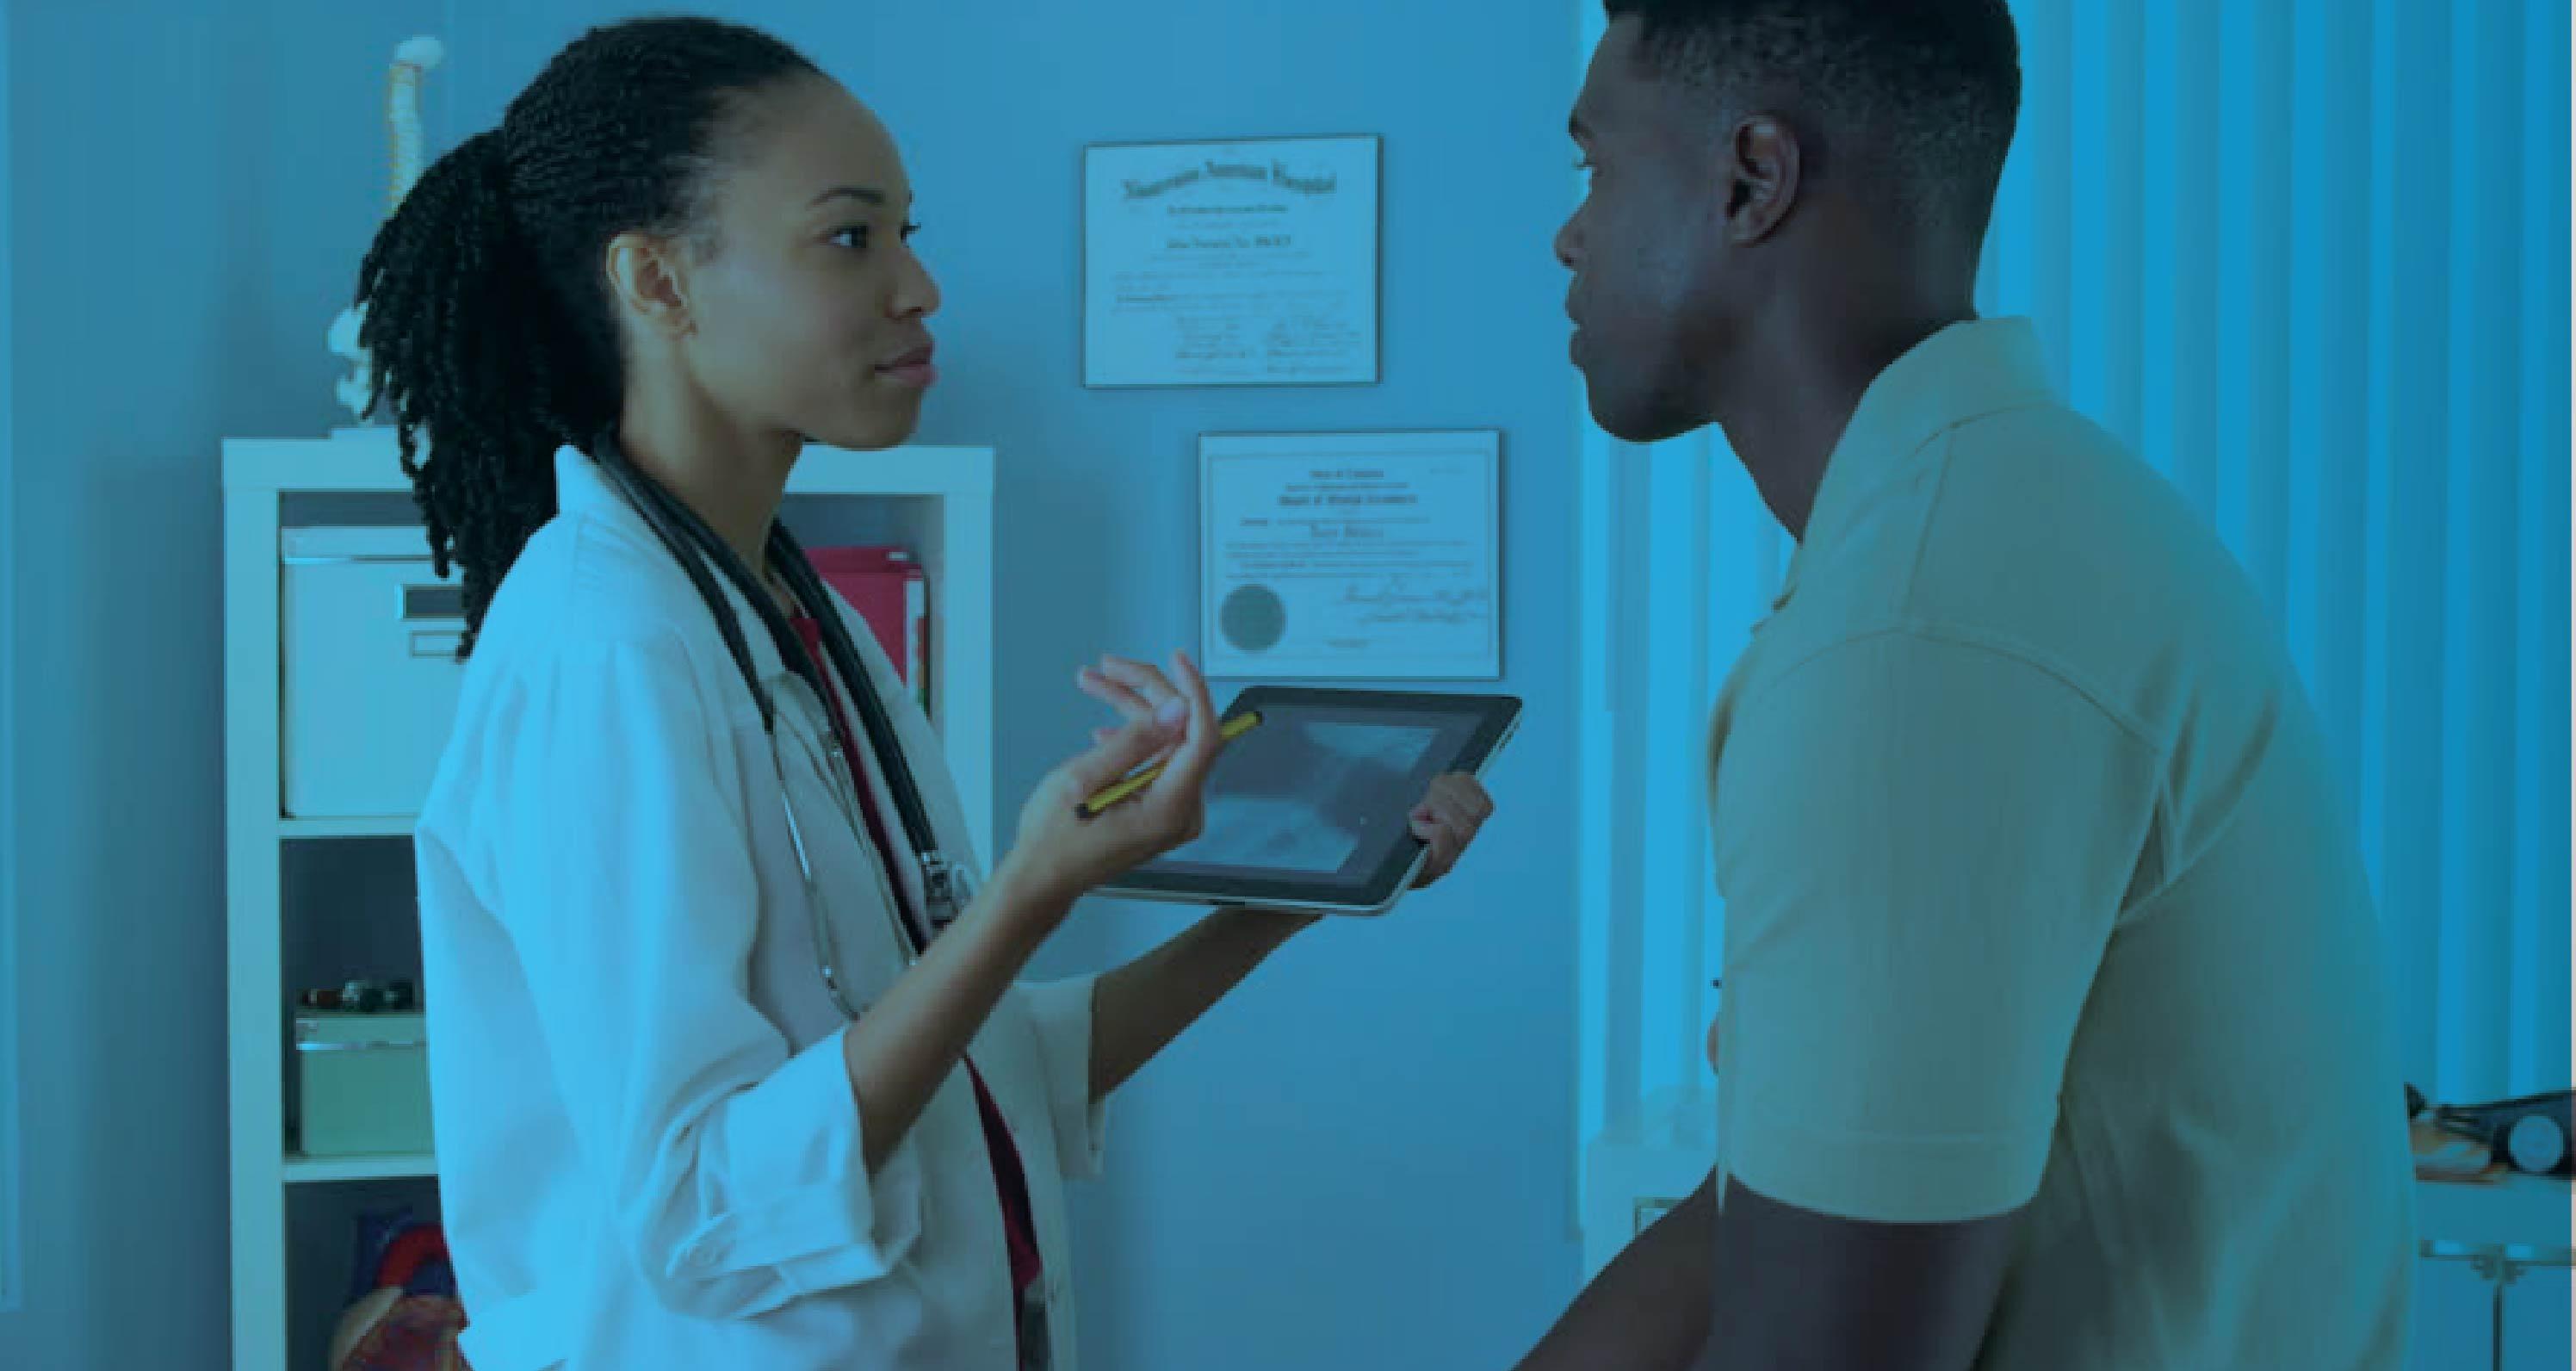 The Patient Voice on Diagnosis, Treatment, & Care